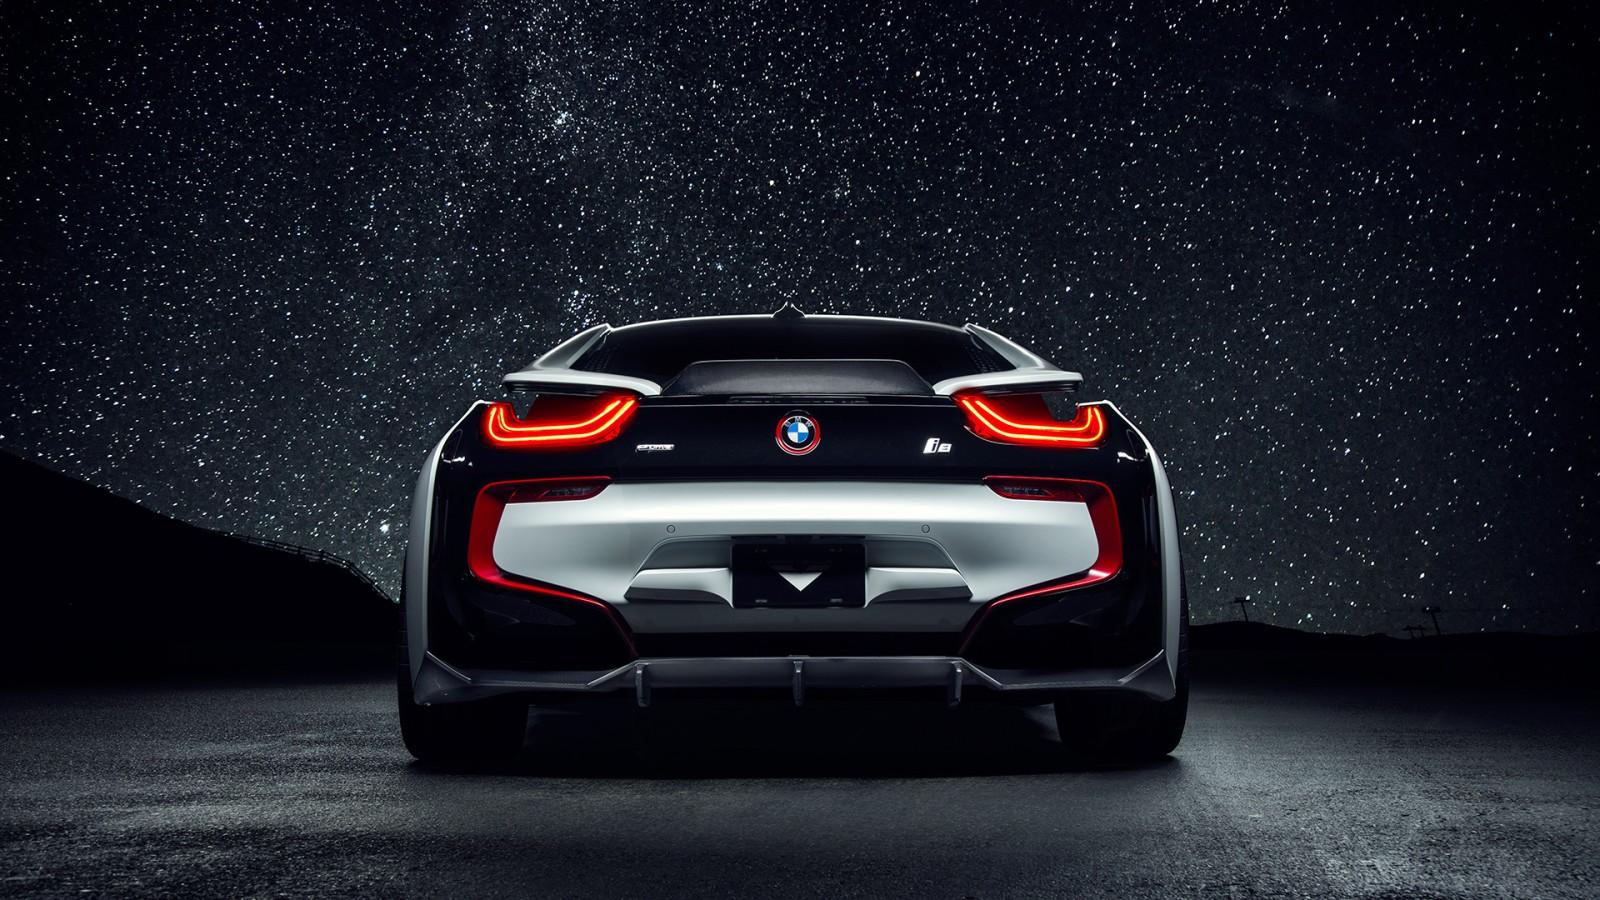 Vorsteiner BMW i8 Aero 2 Wallpaper | HD Car Wallpapers ...